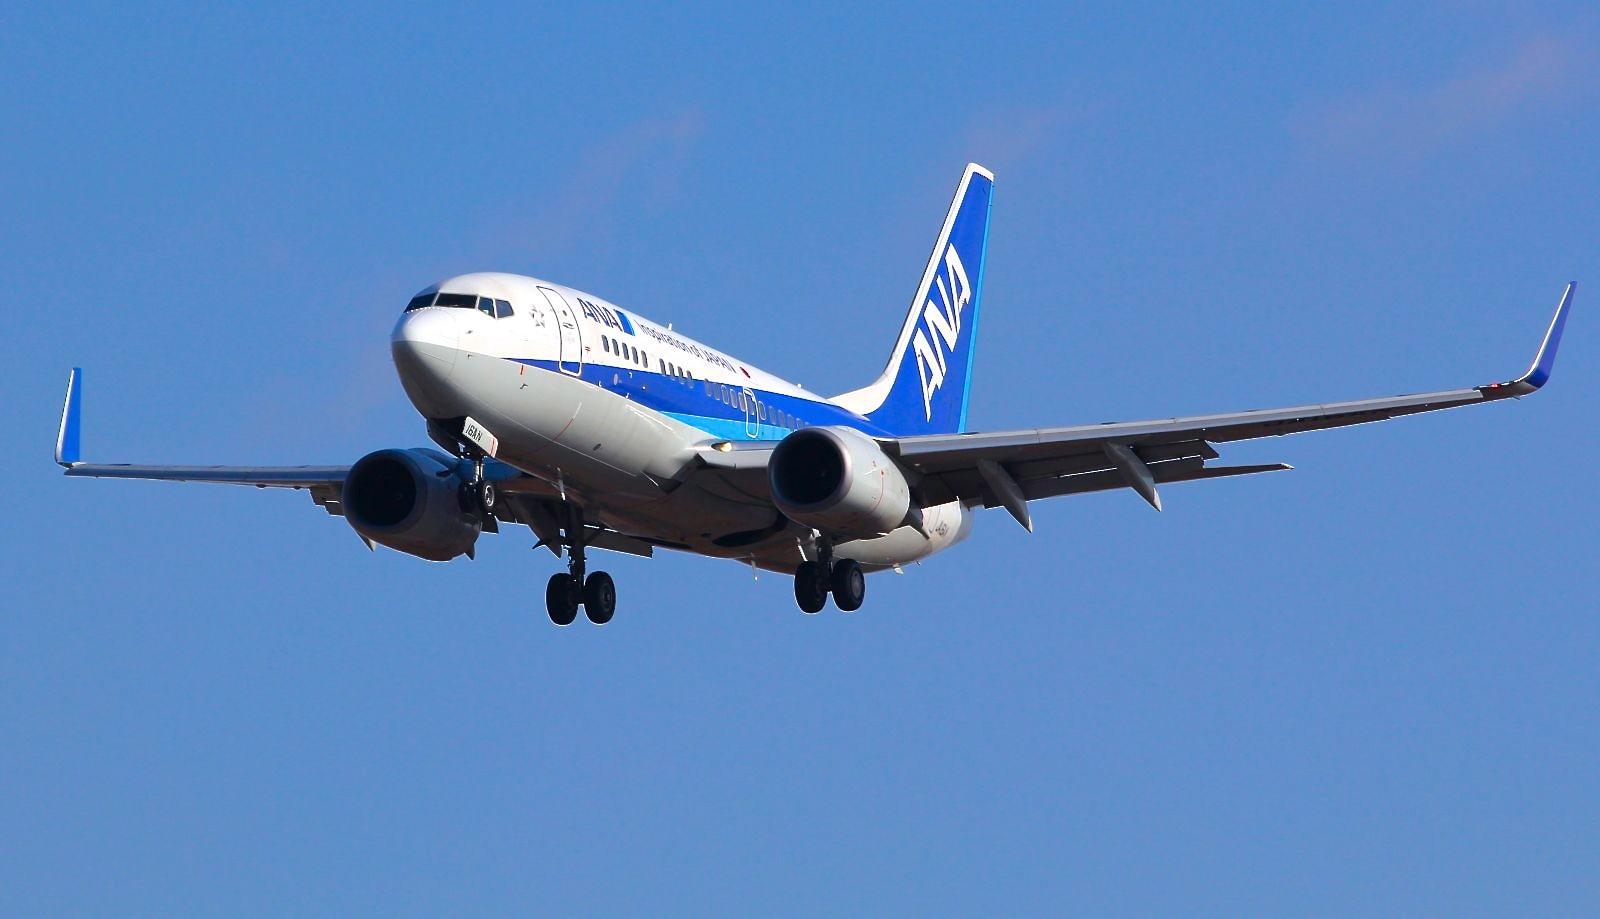 Re:[原创][DLC]冷风万里晴空试镜 BOEING 737-700  中国大连周水子国际机场